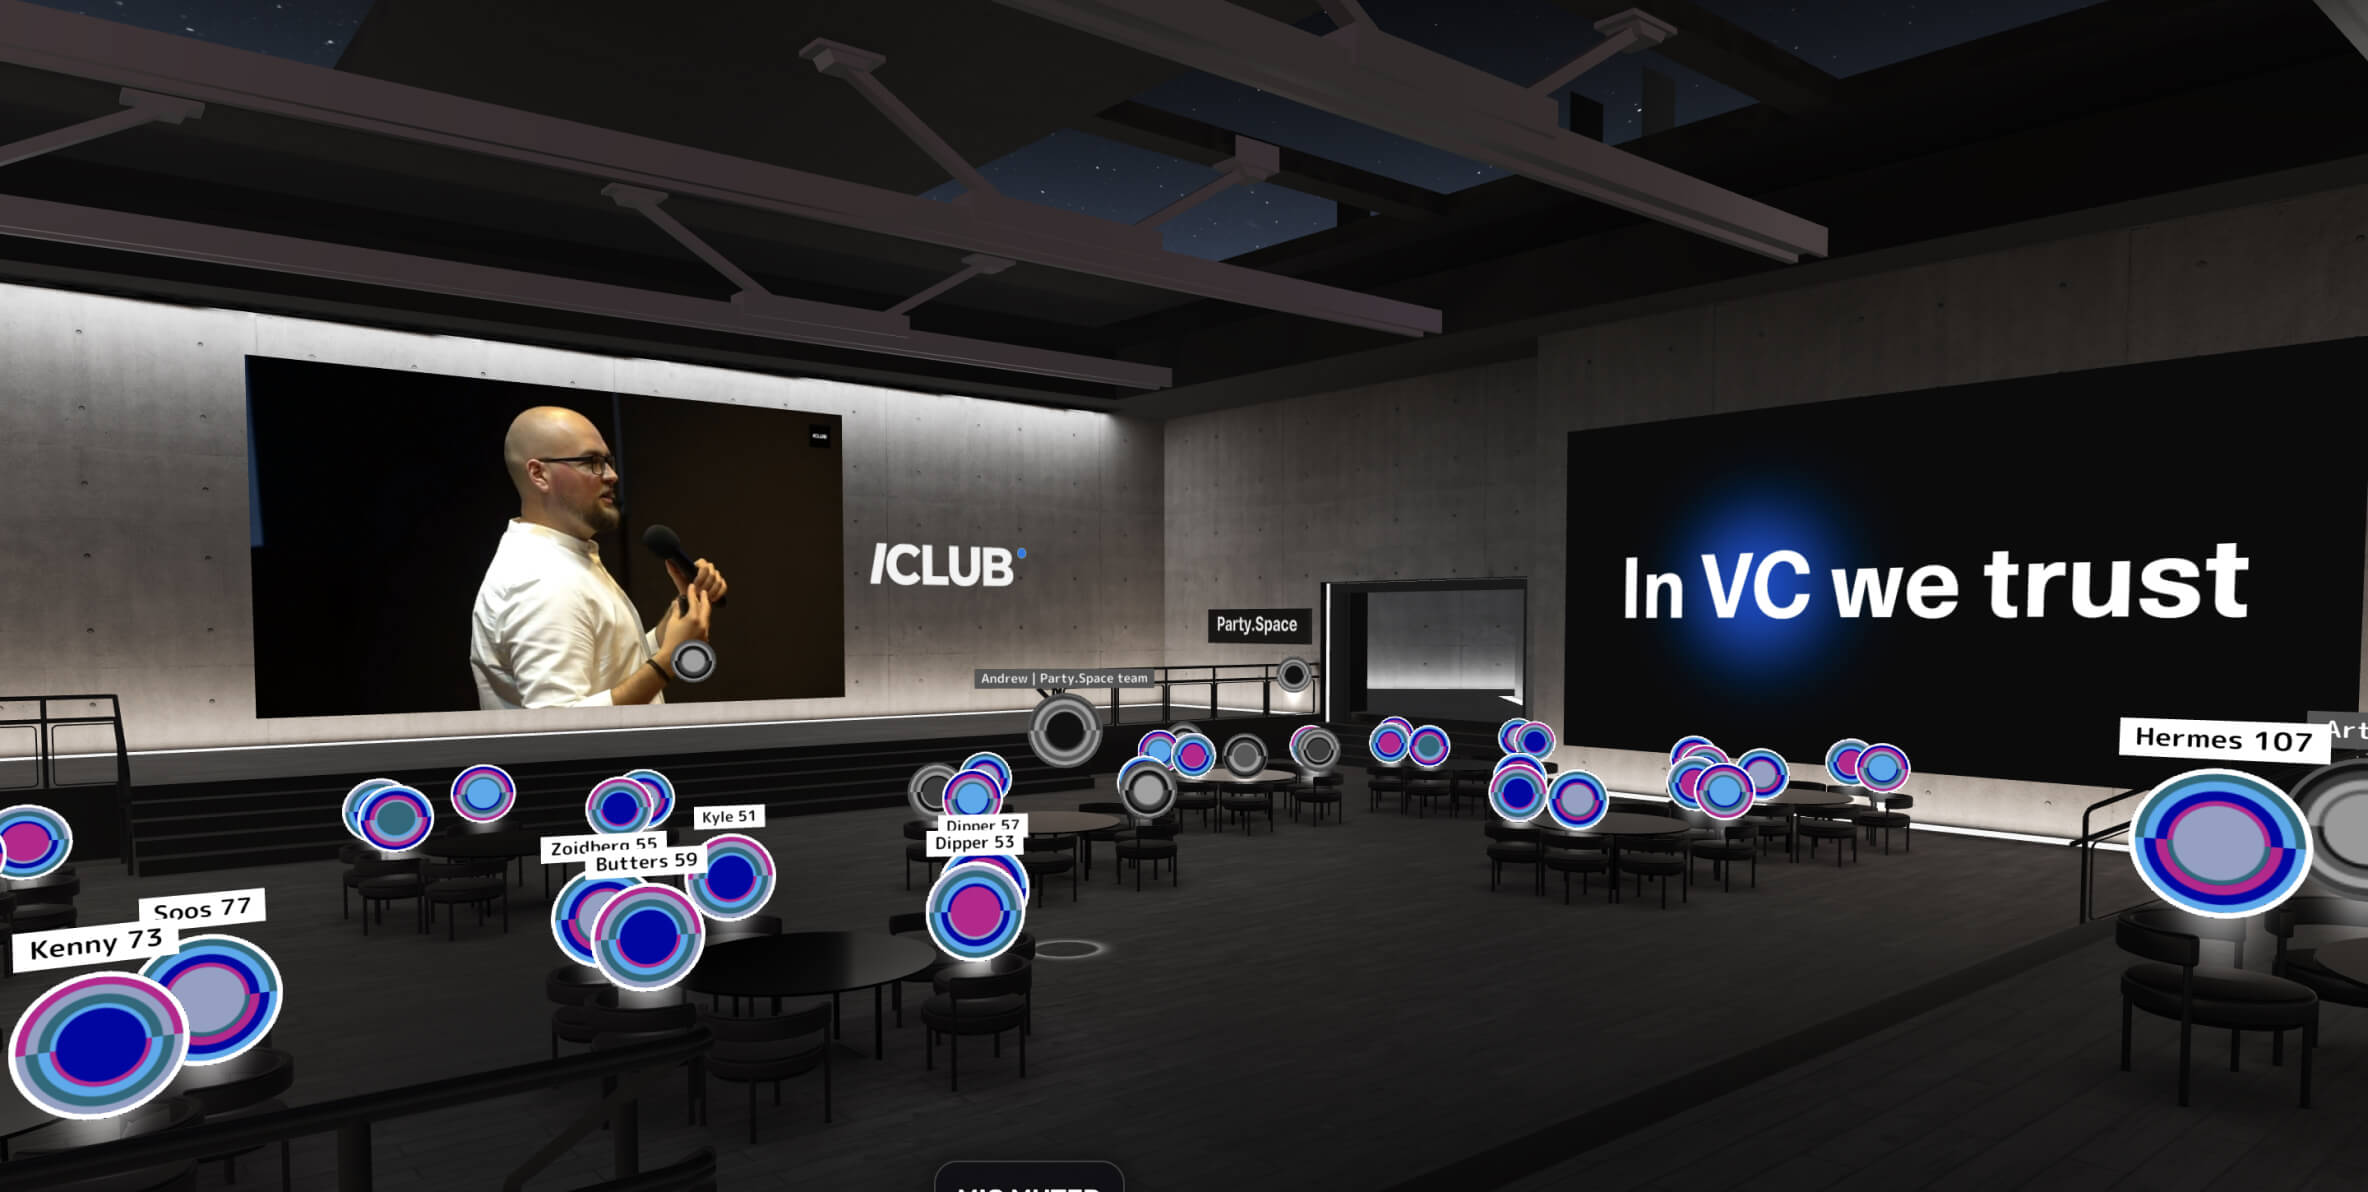 Український стартап Party.Space залучив $1 млн від TA Ventures, ICLUB і Day One Capital - tech, startups, news, investytsiyi